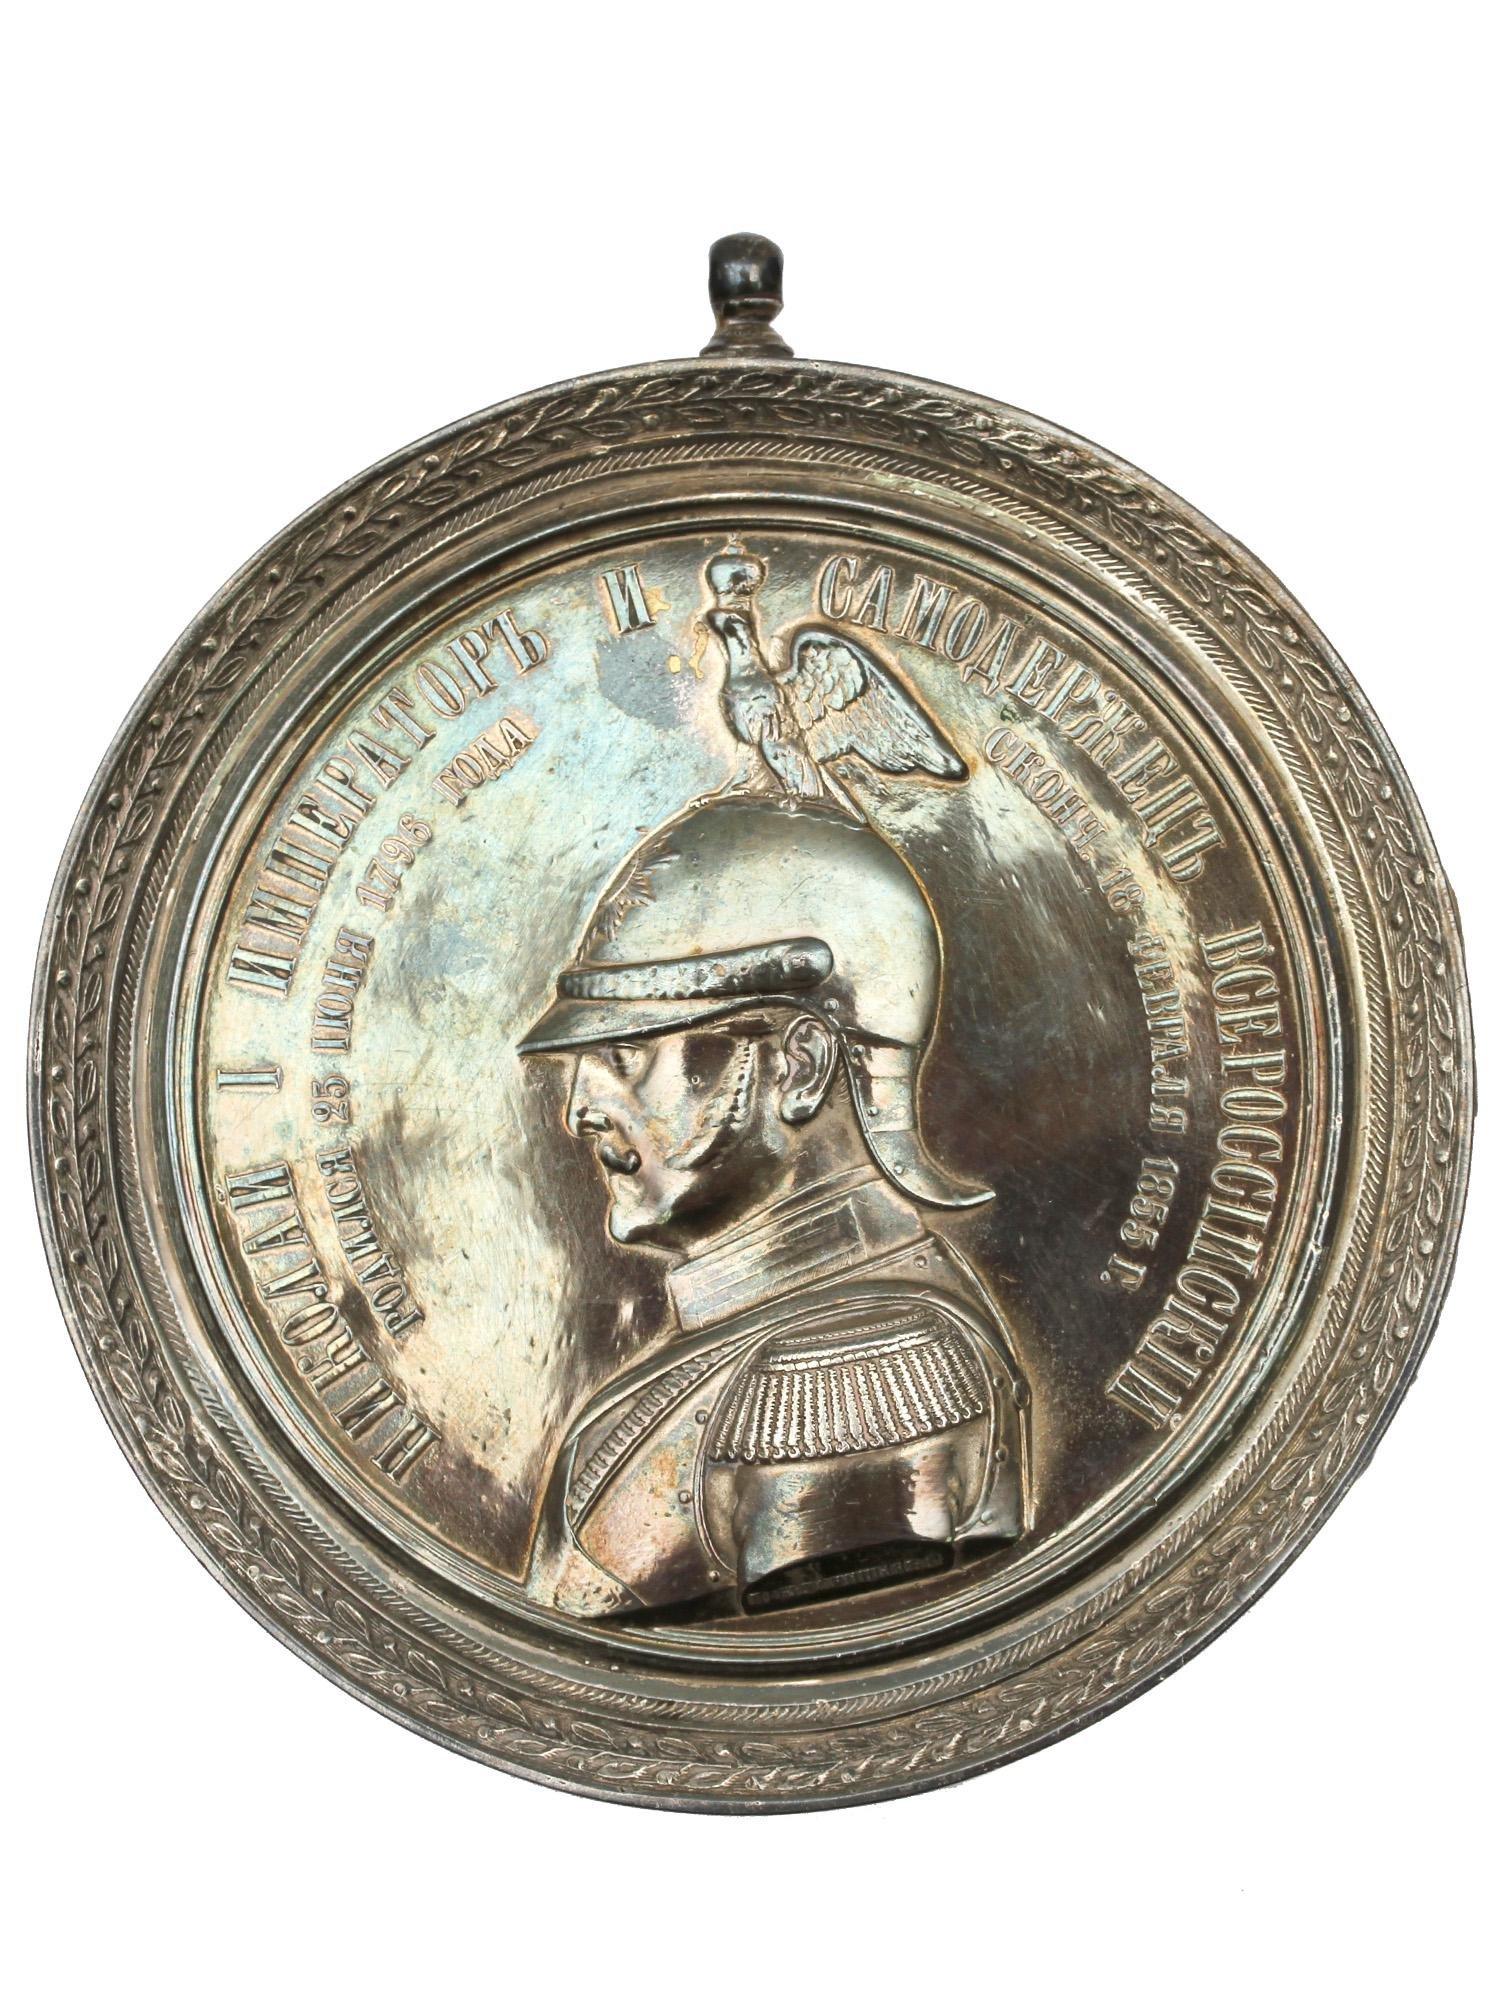 A RUSSIAN SILVER COMMEMORATIVE MEDAL NICHOLAS I